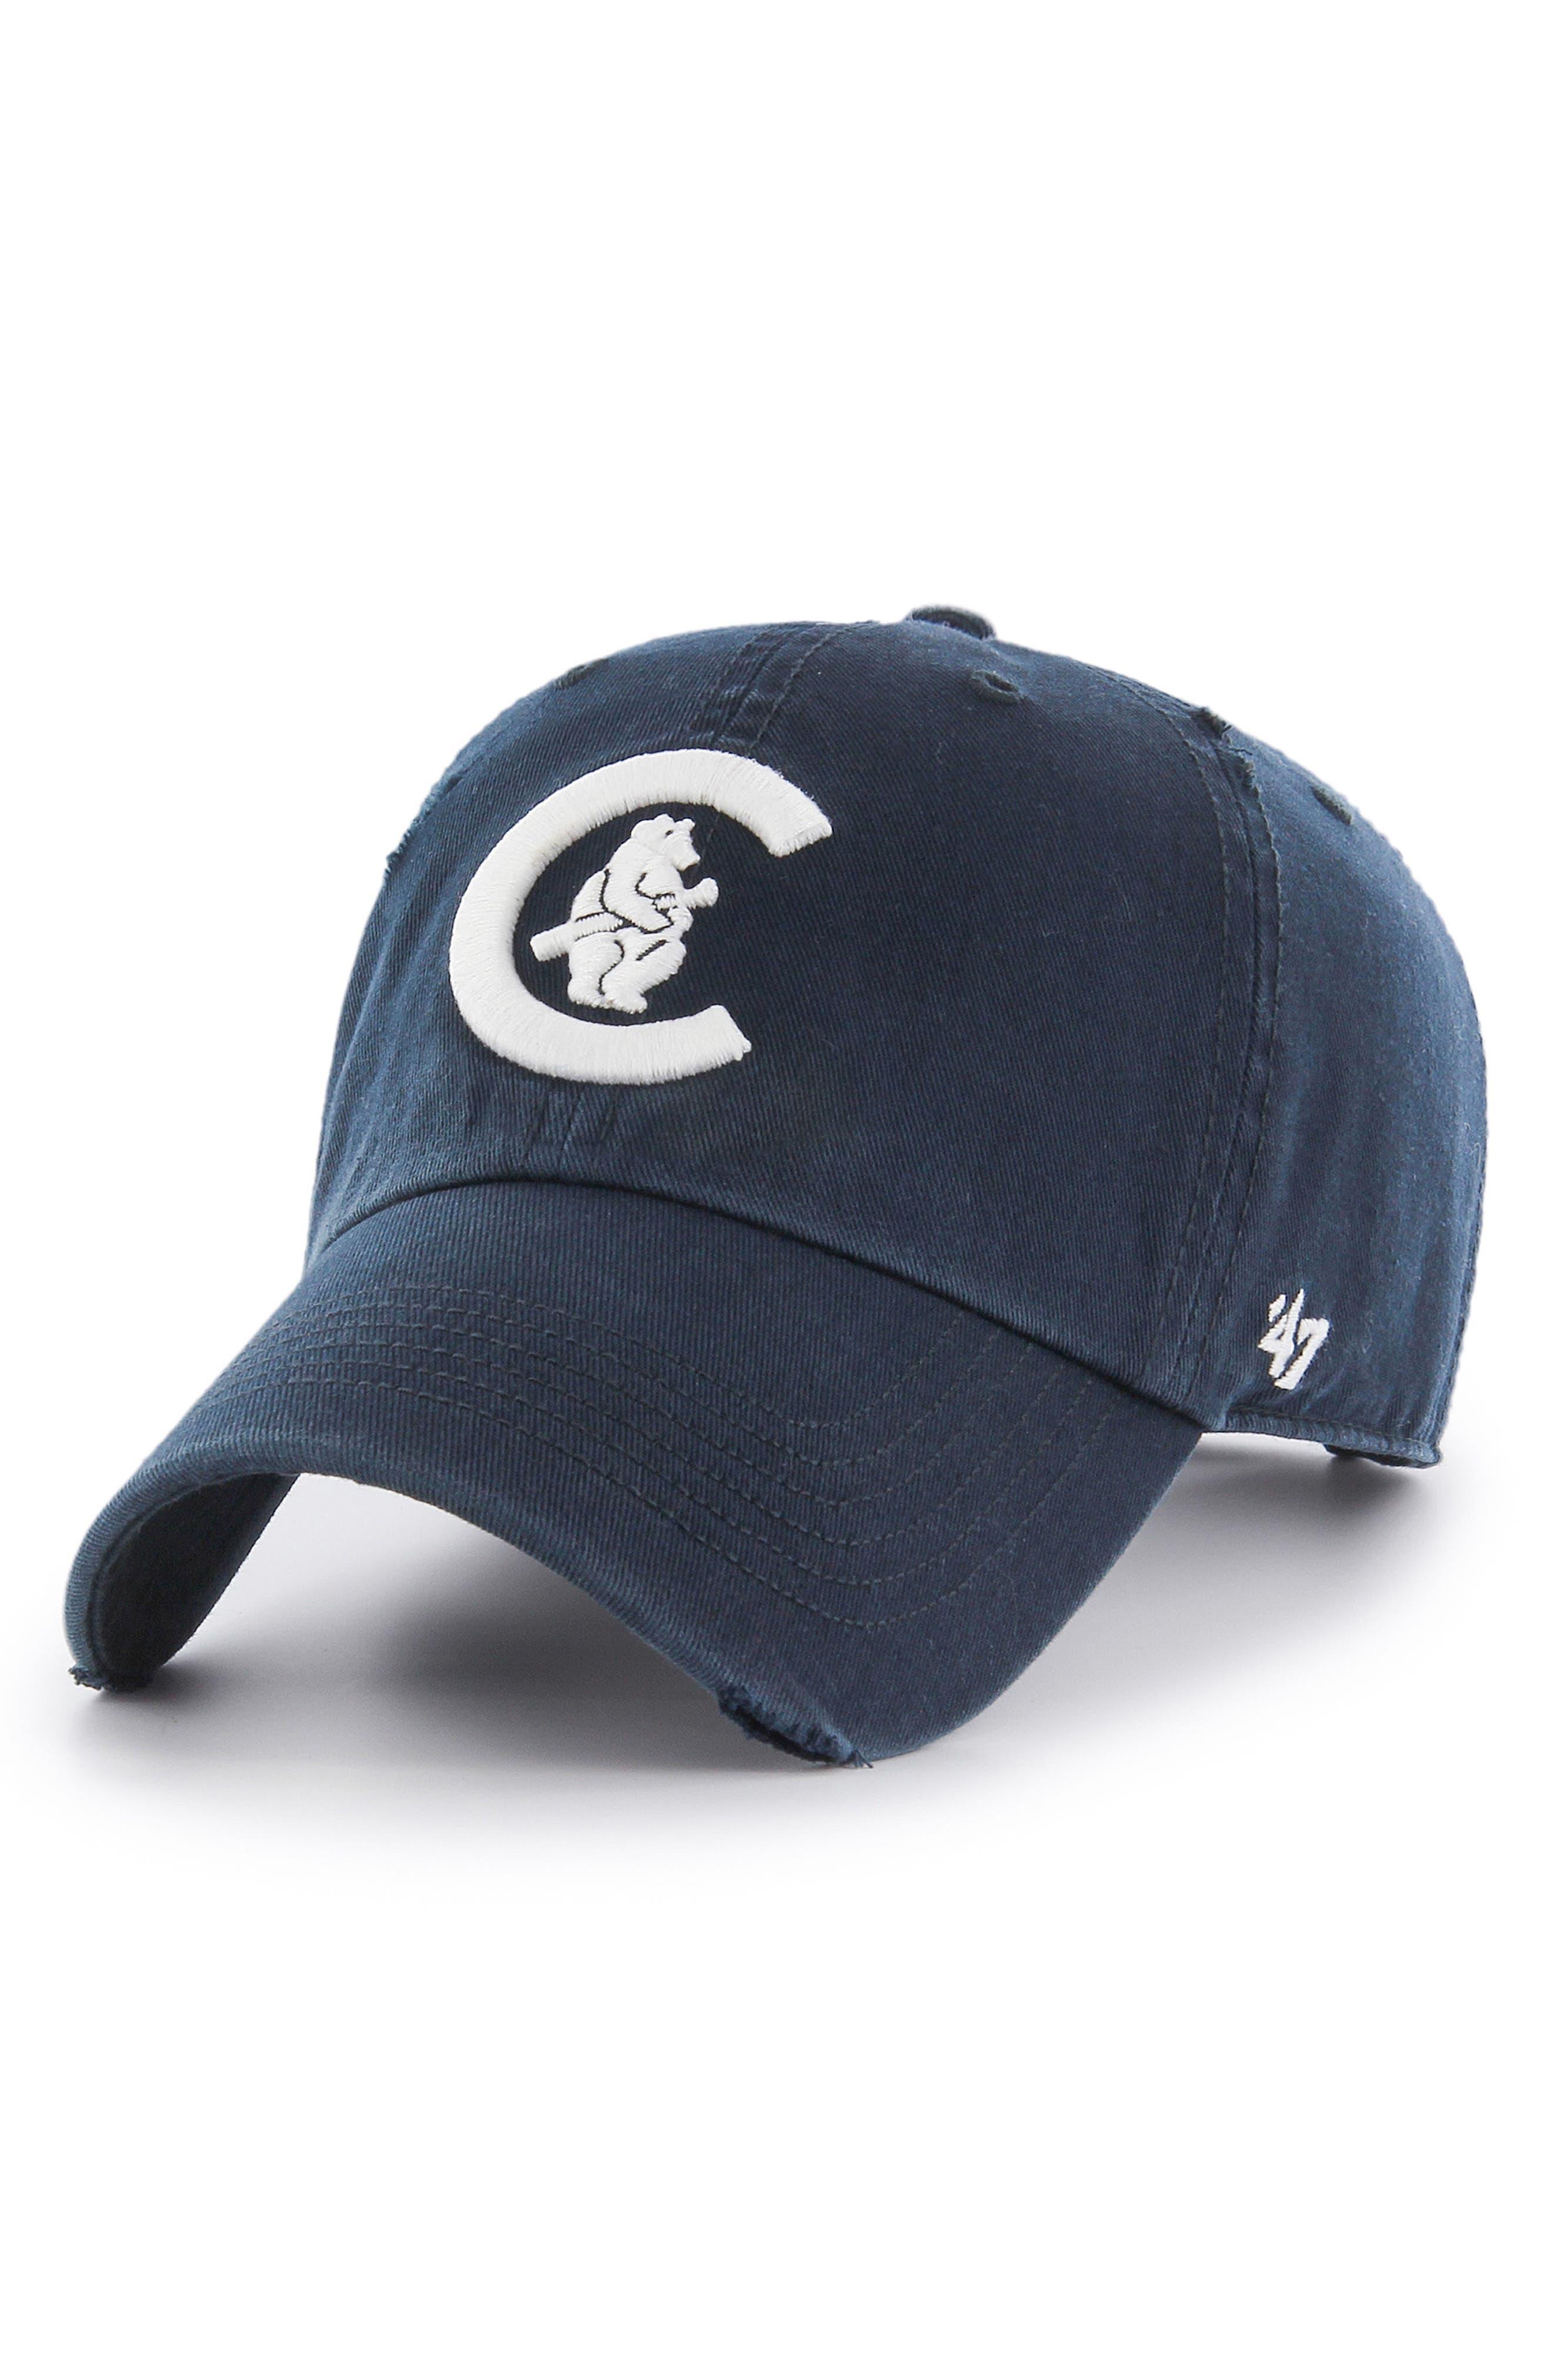 47 Brand Cooperstown Ridge Chicago Cubs Baseball Cap,                             Main thumbnail 1, color,                             410